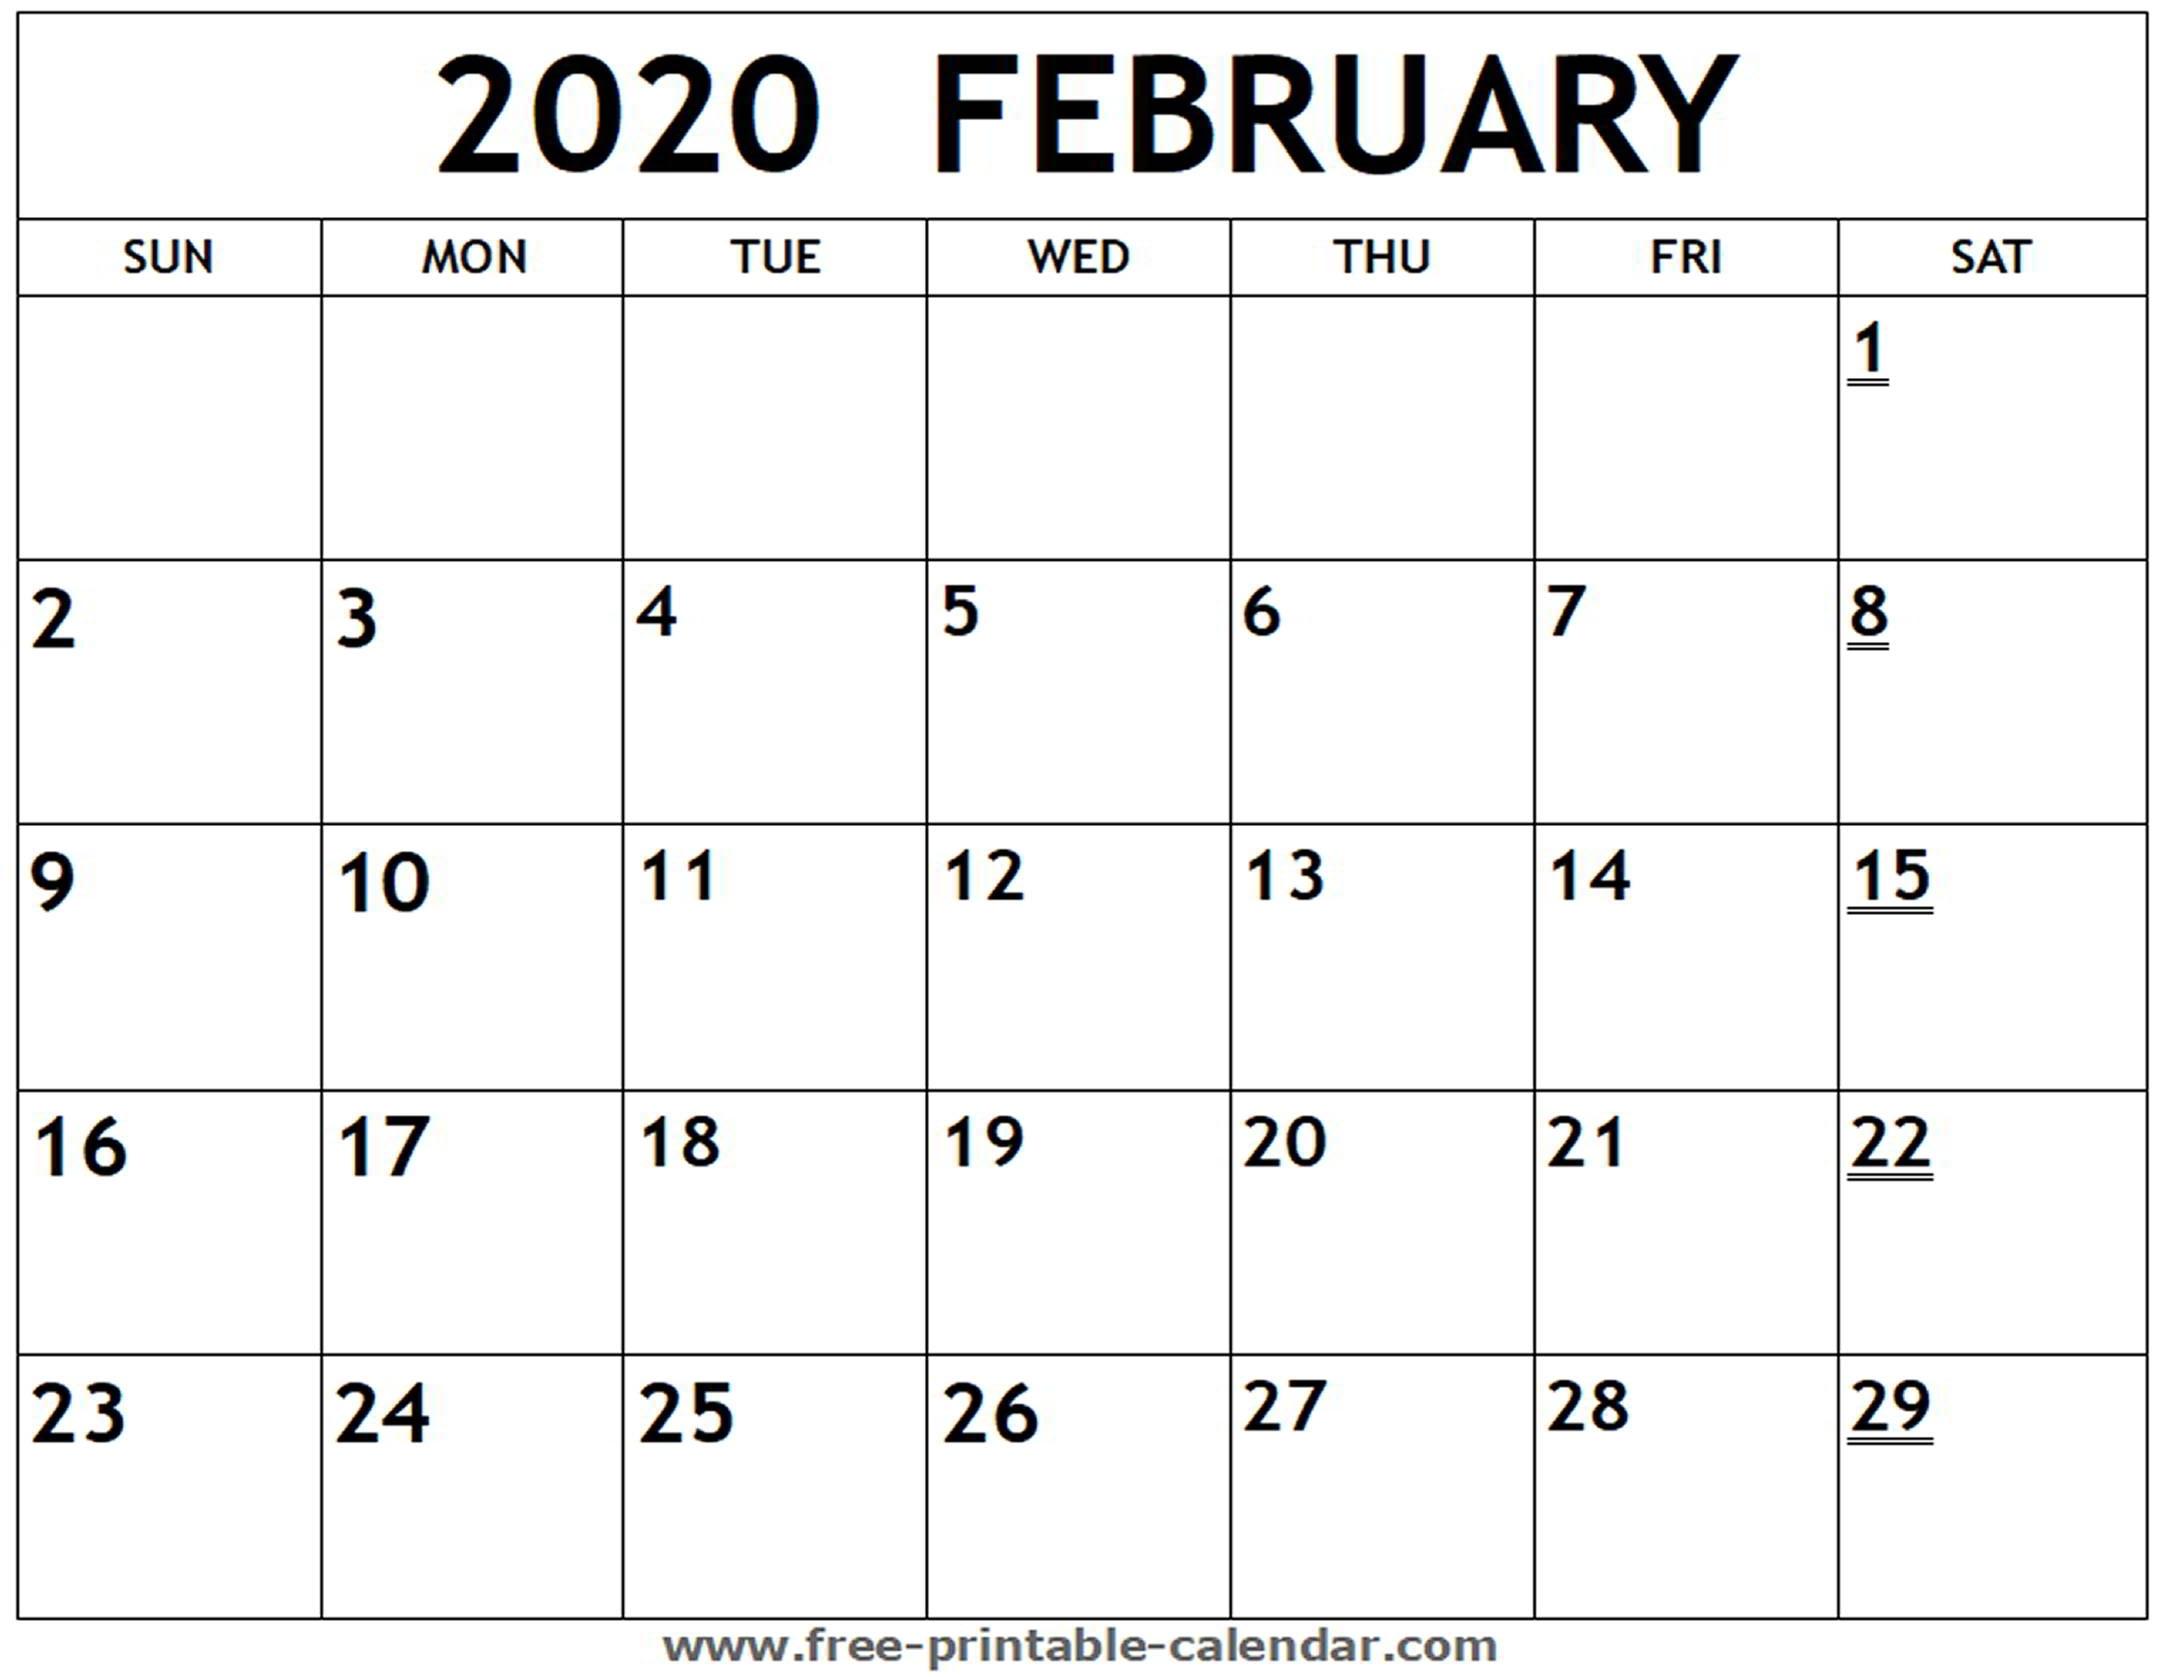 Printable 2020 February Calendar - Free-Printable-Calendar with Free Printable 2020 Calendar To I Can Edit